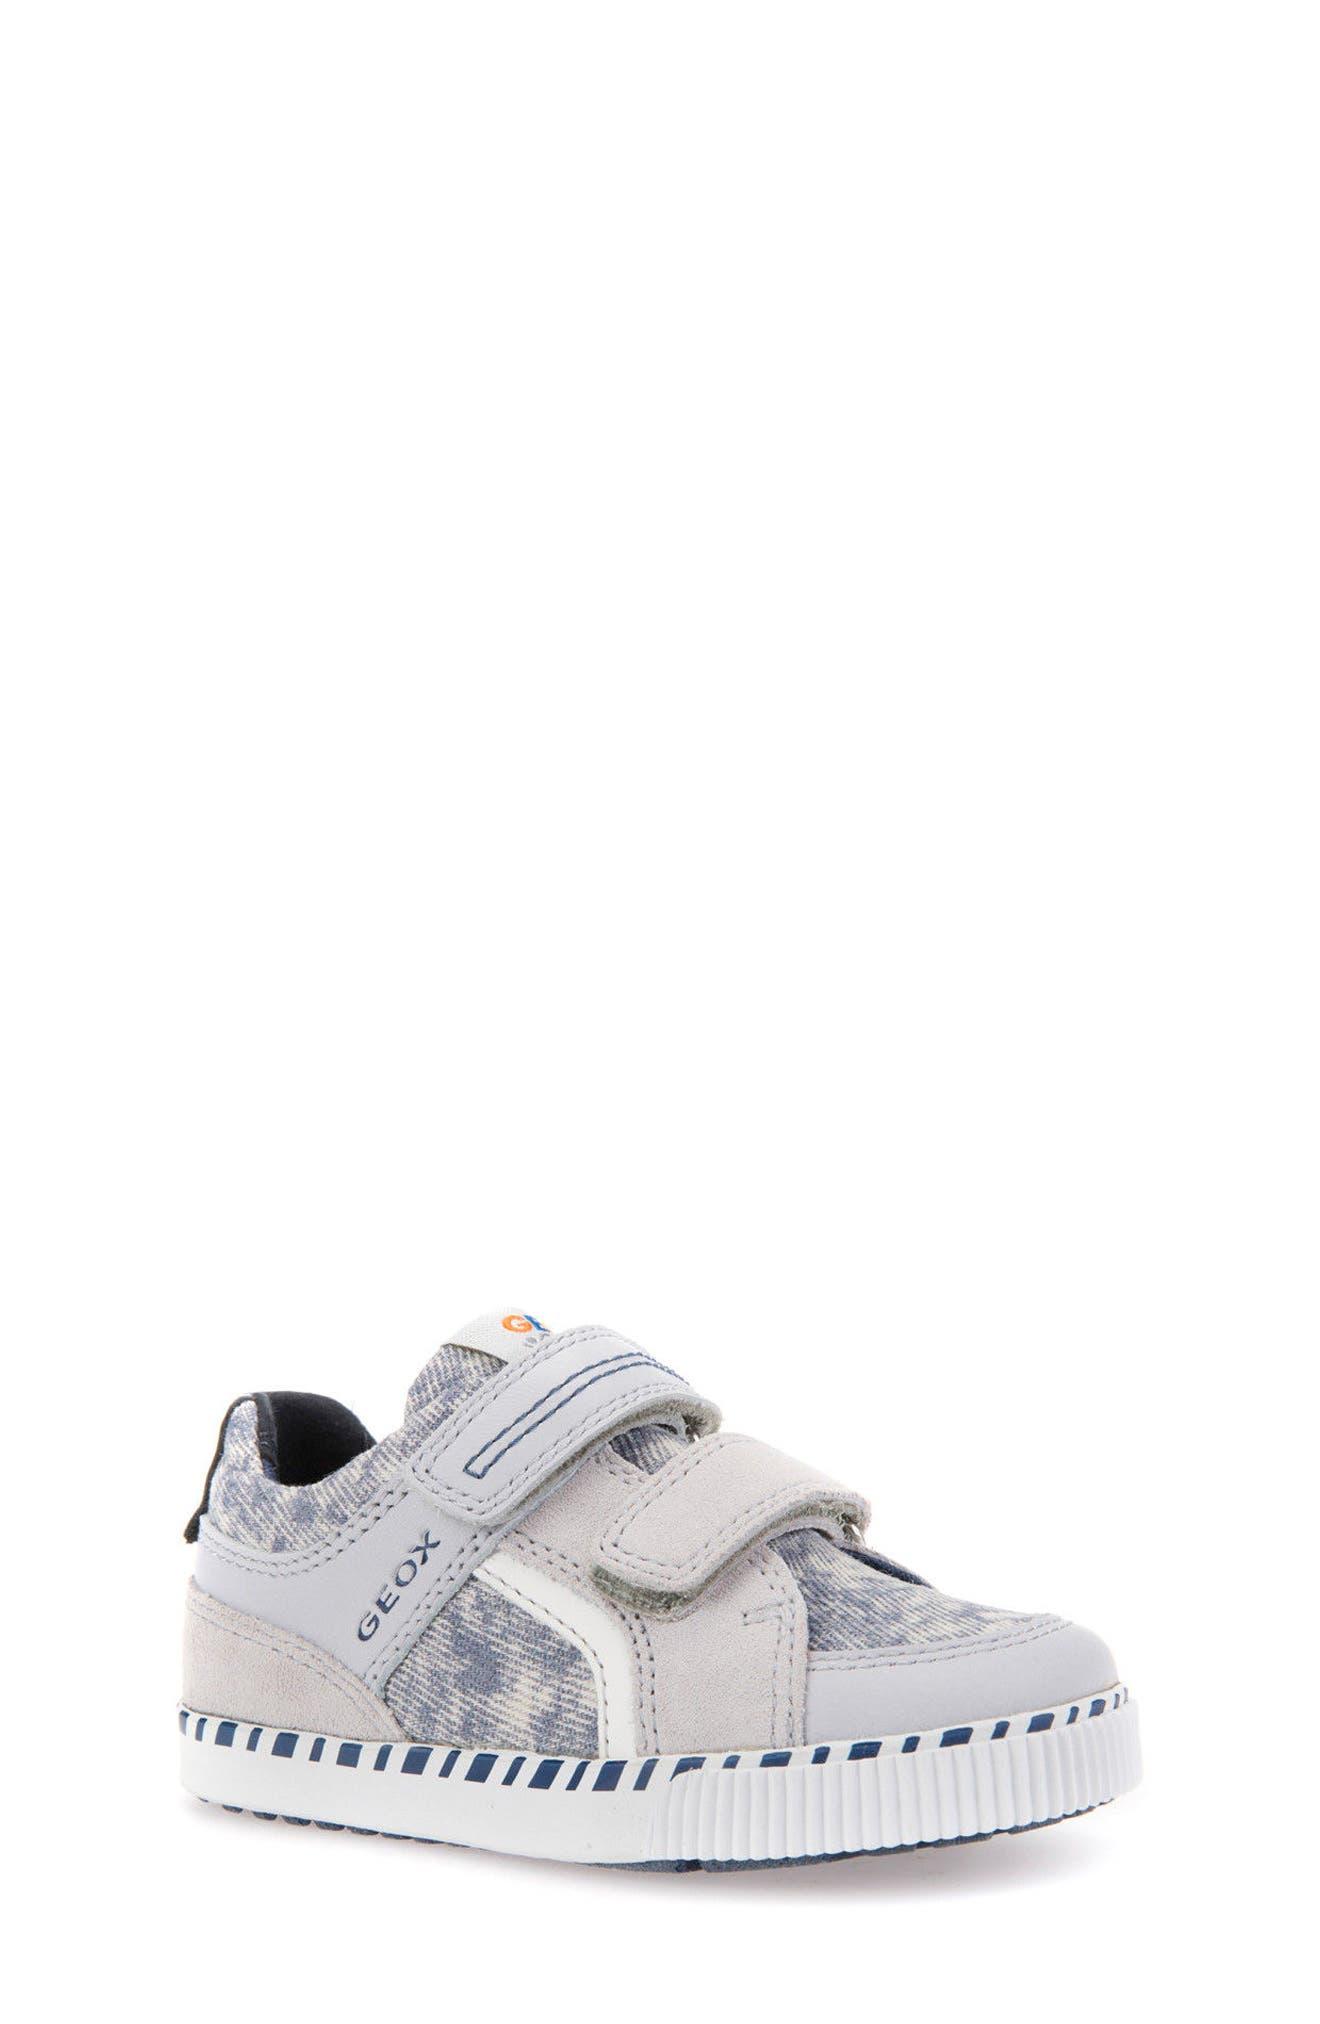 Kilwi Knit Sneaker,                         Main,                         color, LIGHT GREY/ WHITE